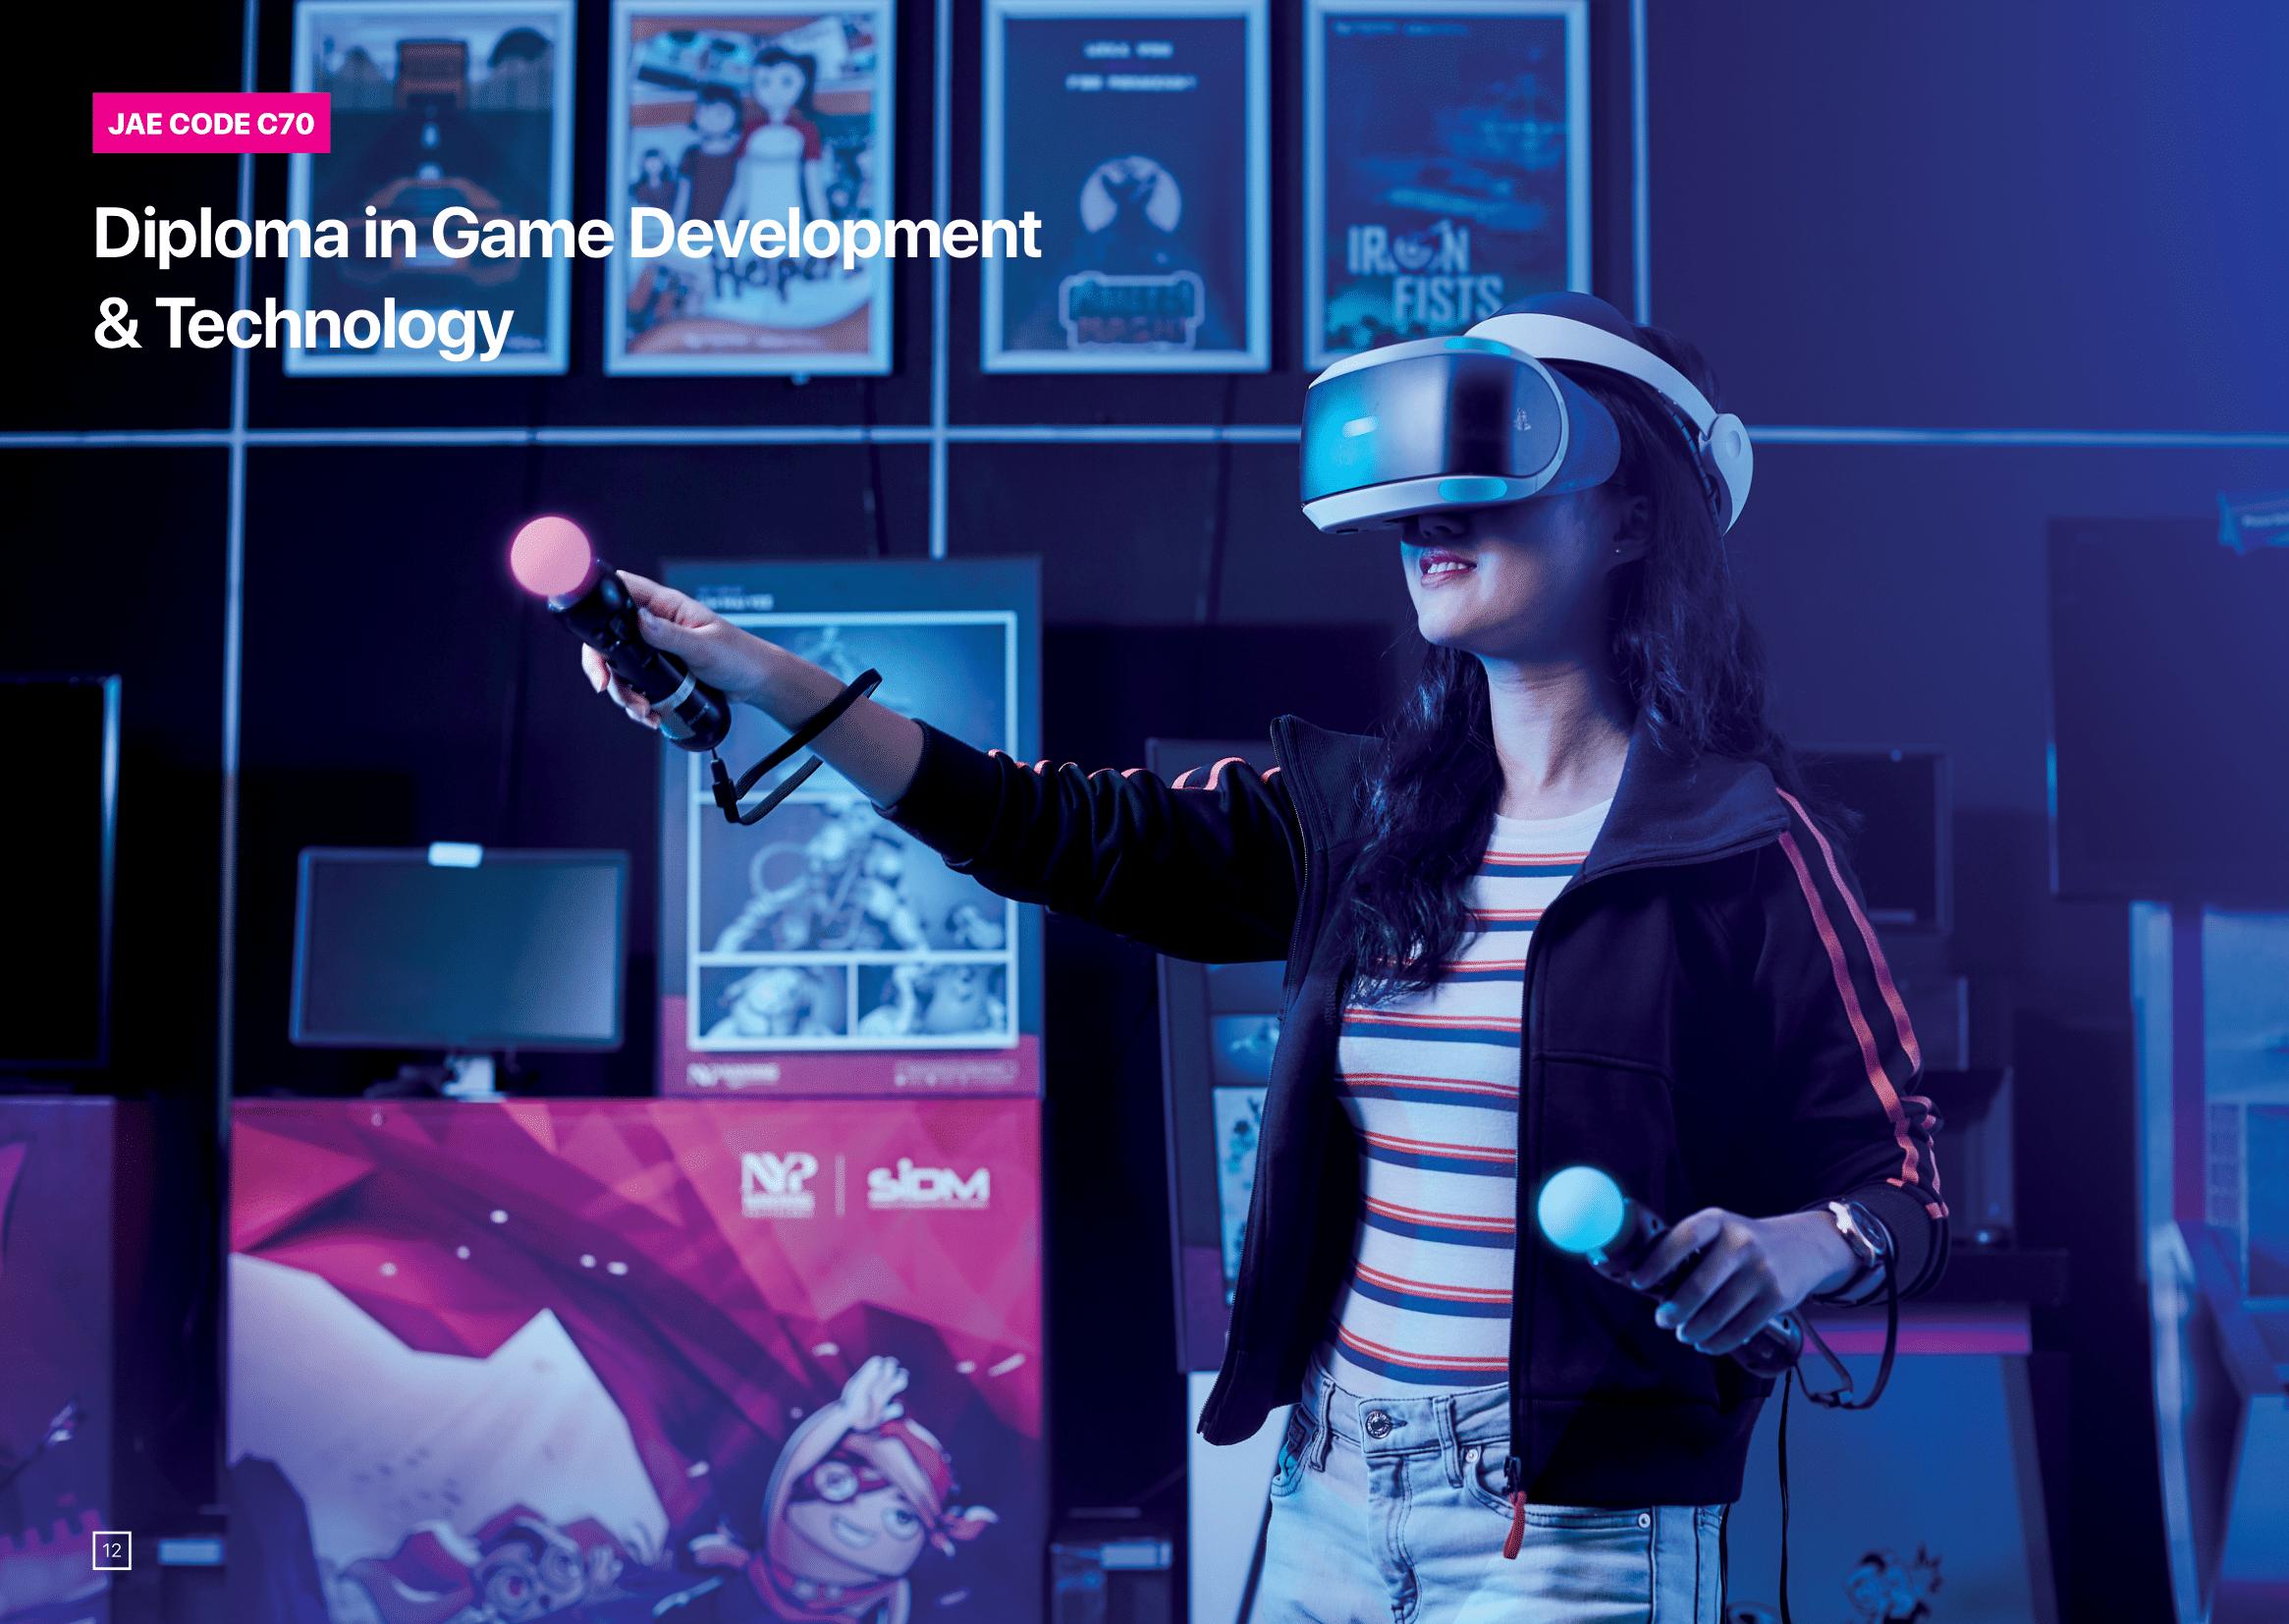 School of Interactive and Digital Media 2020-08